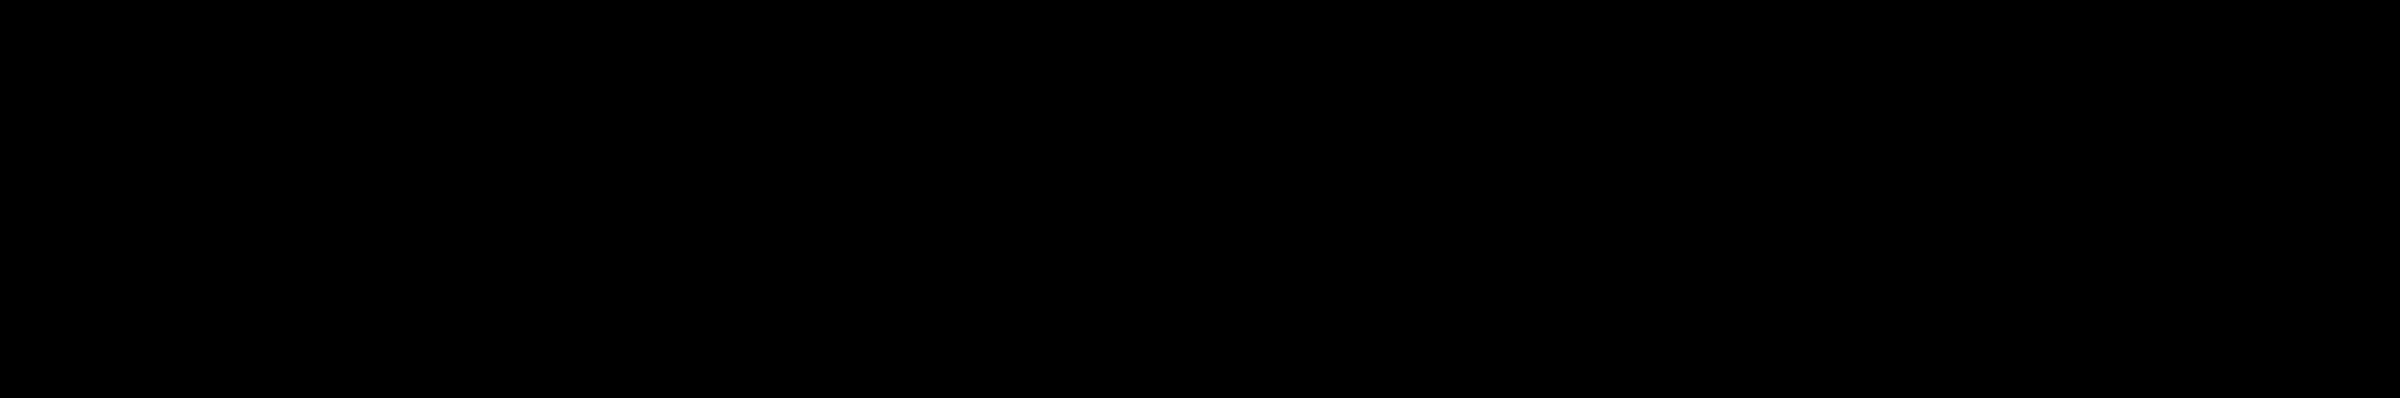 Geely Fc manufacturer logo